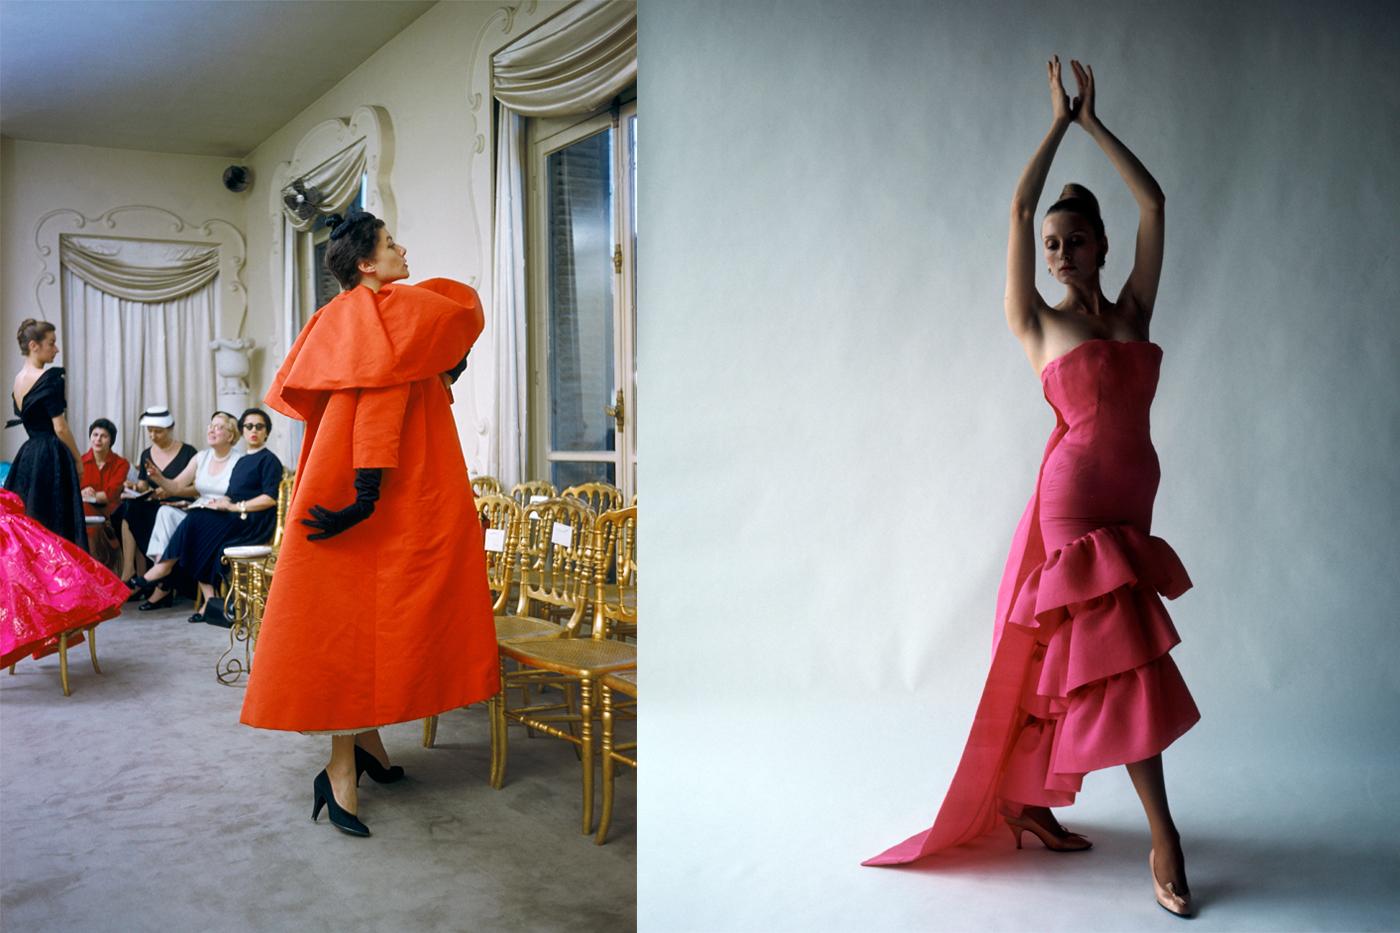 Un mannequin portant un manteau orange Balenciaga, Paris, 1954 © Mark Shaw / Robe du soir style flamenco, Cristóbal Balenciaga, Paris, 1961 © Cecil Beaton